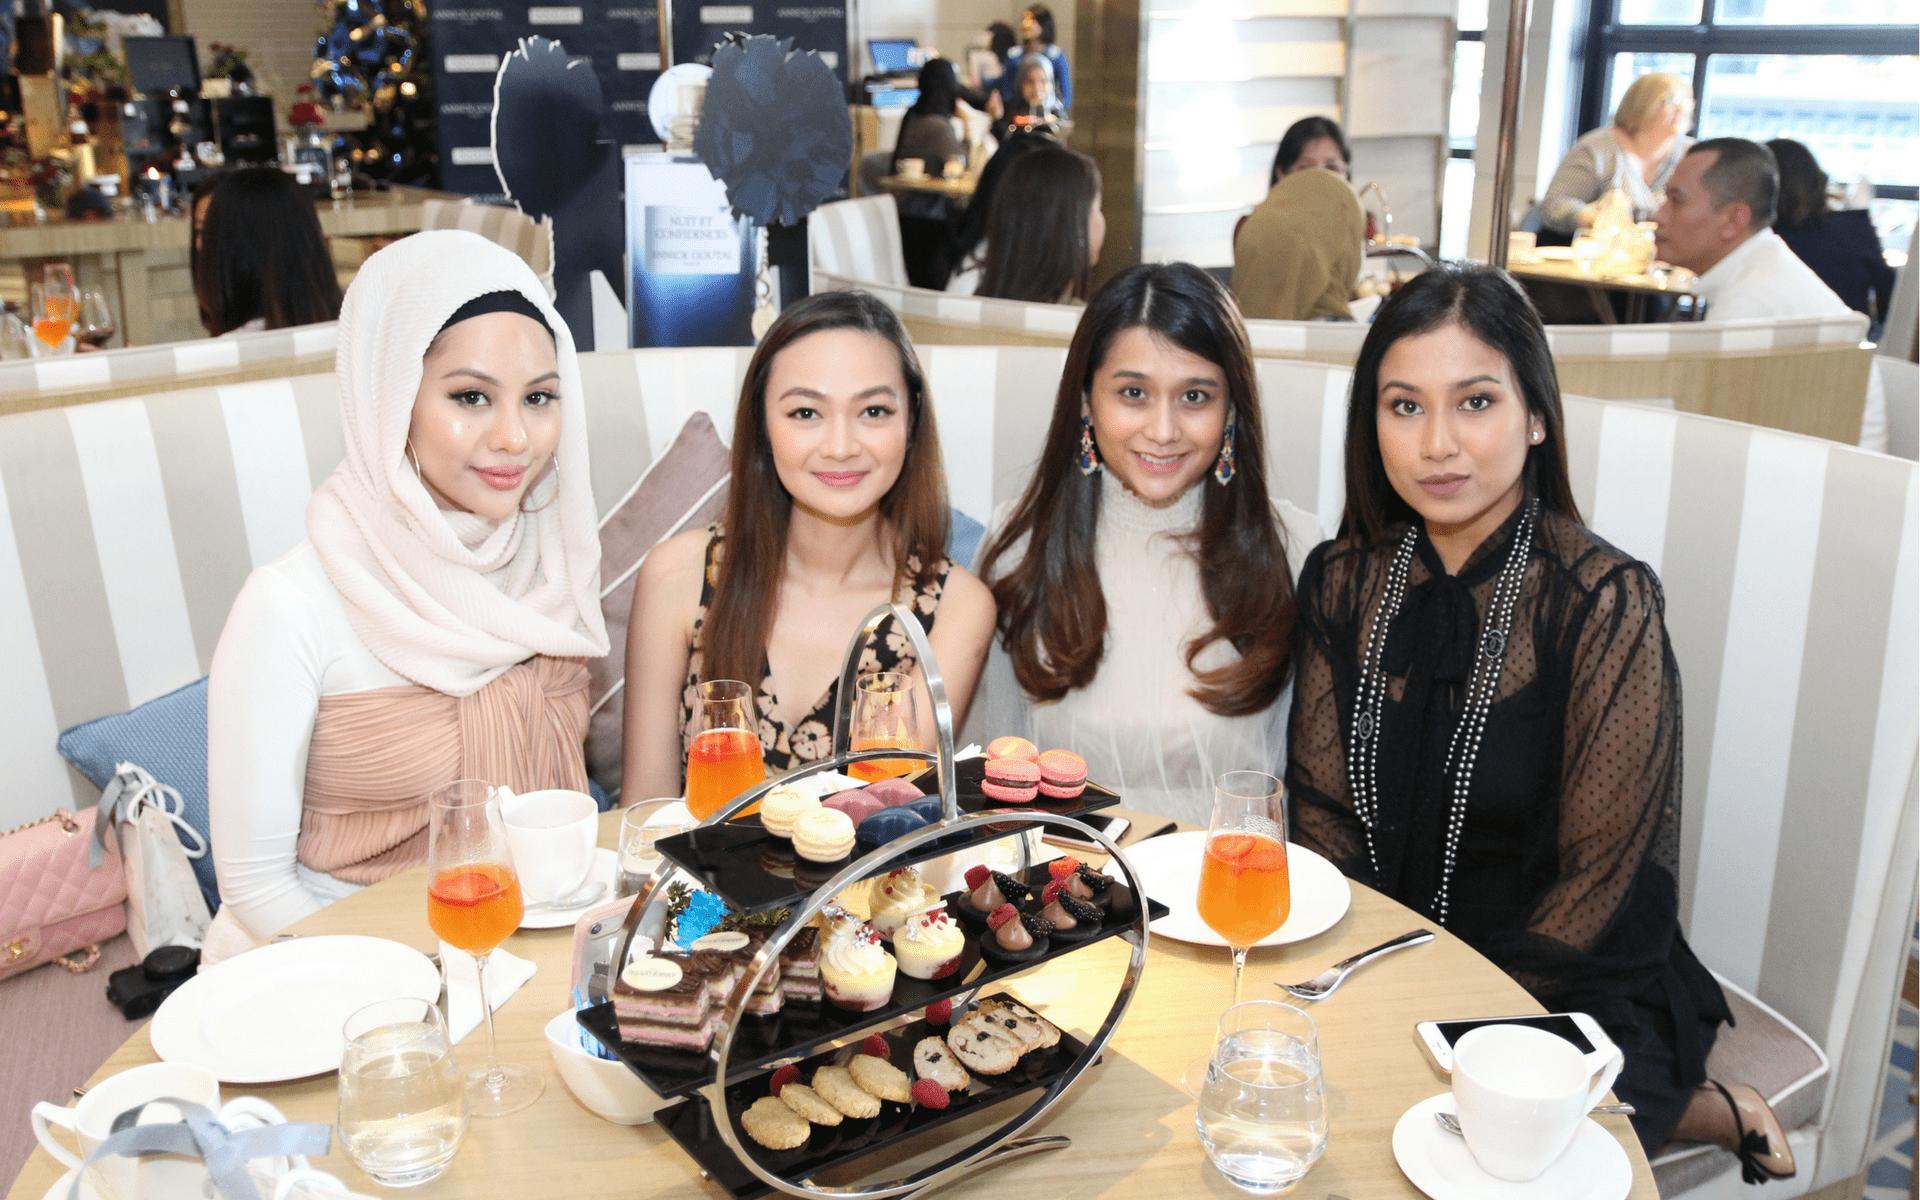 Erin Adlina, Nik Ireena Nona, Ezzan Zulfadzli and Puteri Nurul Nadhirah